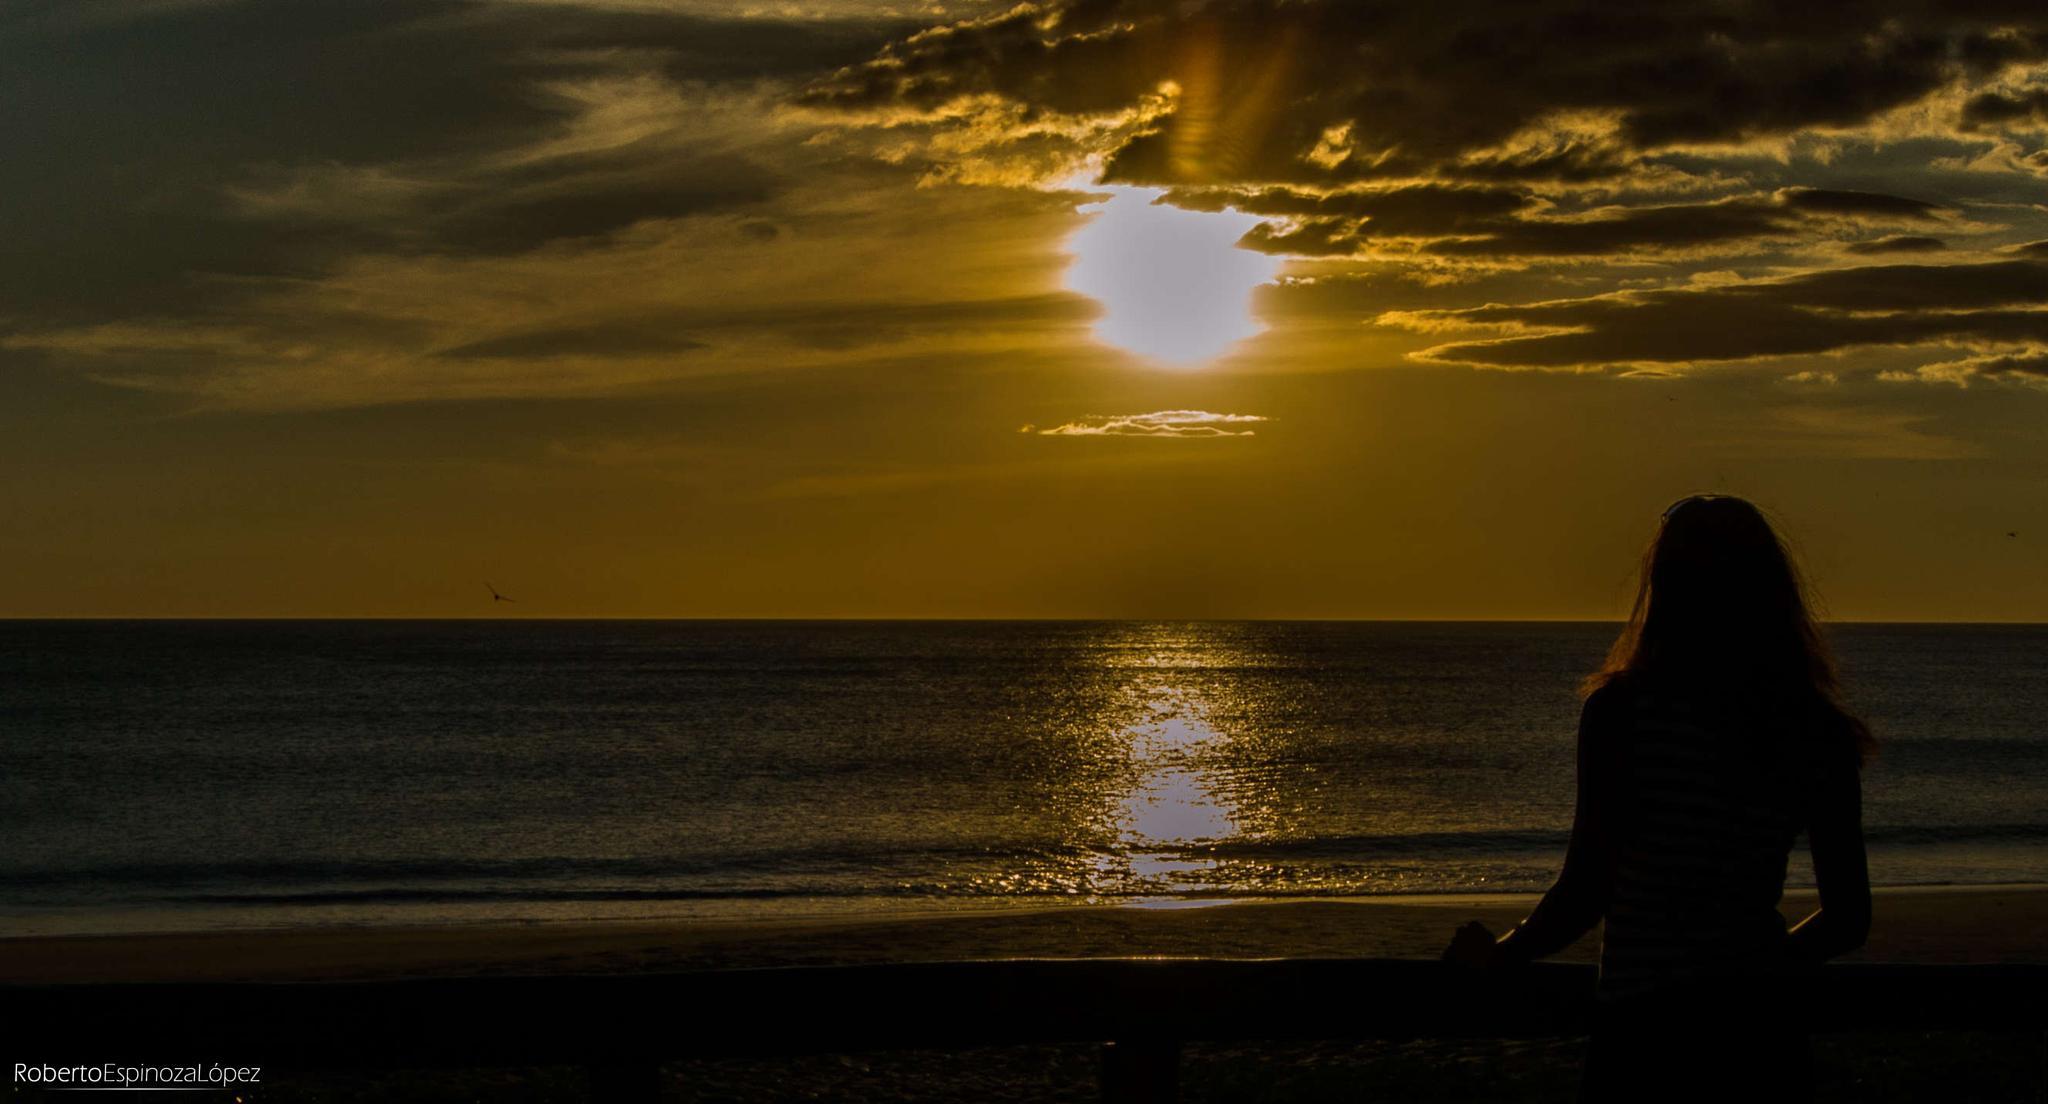 Sunset by robertespinozalopez